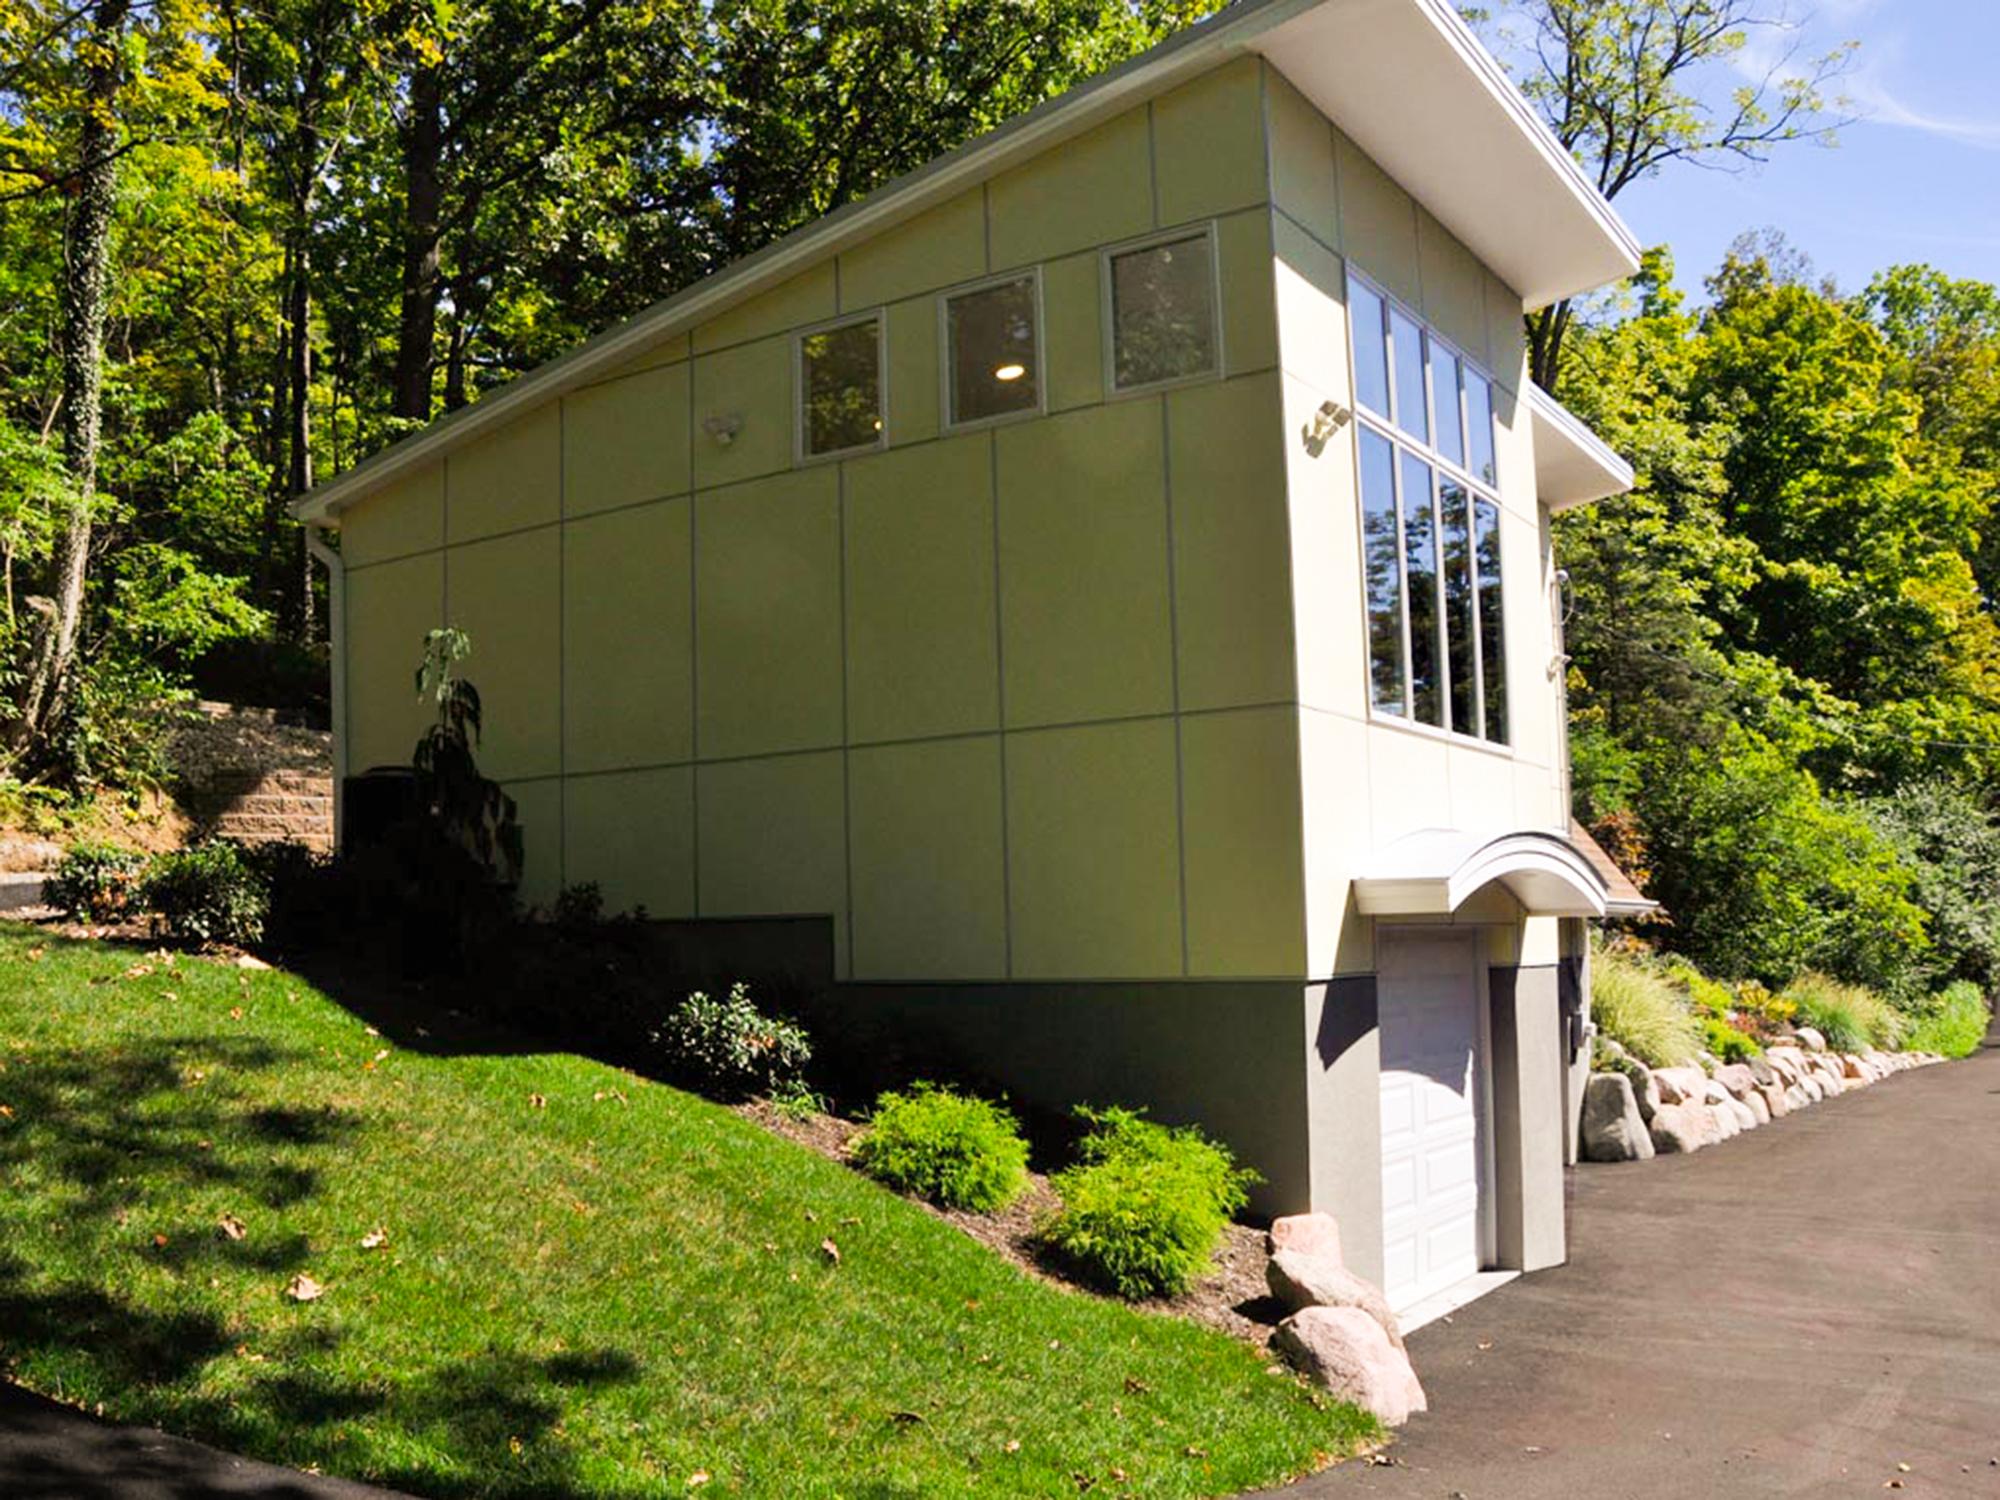 Art studio over 3-stall garage Wilcox Architecture